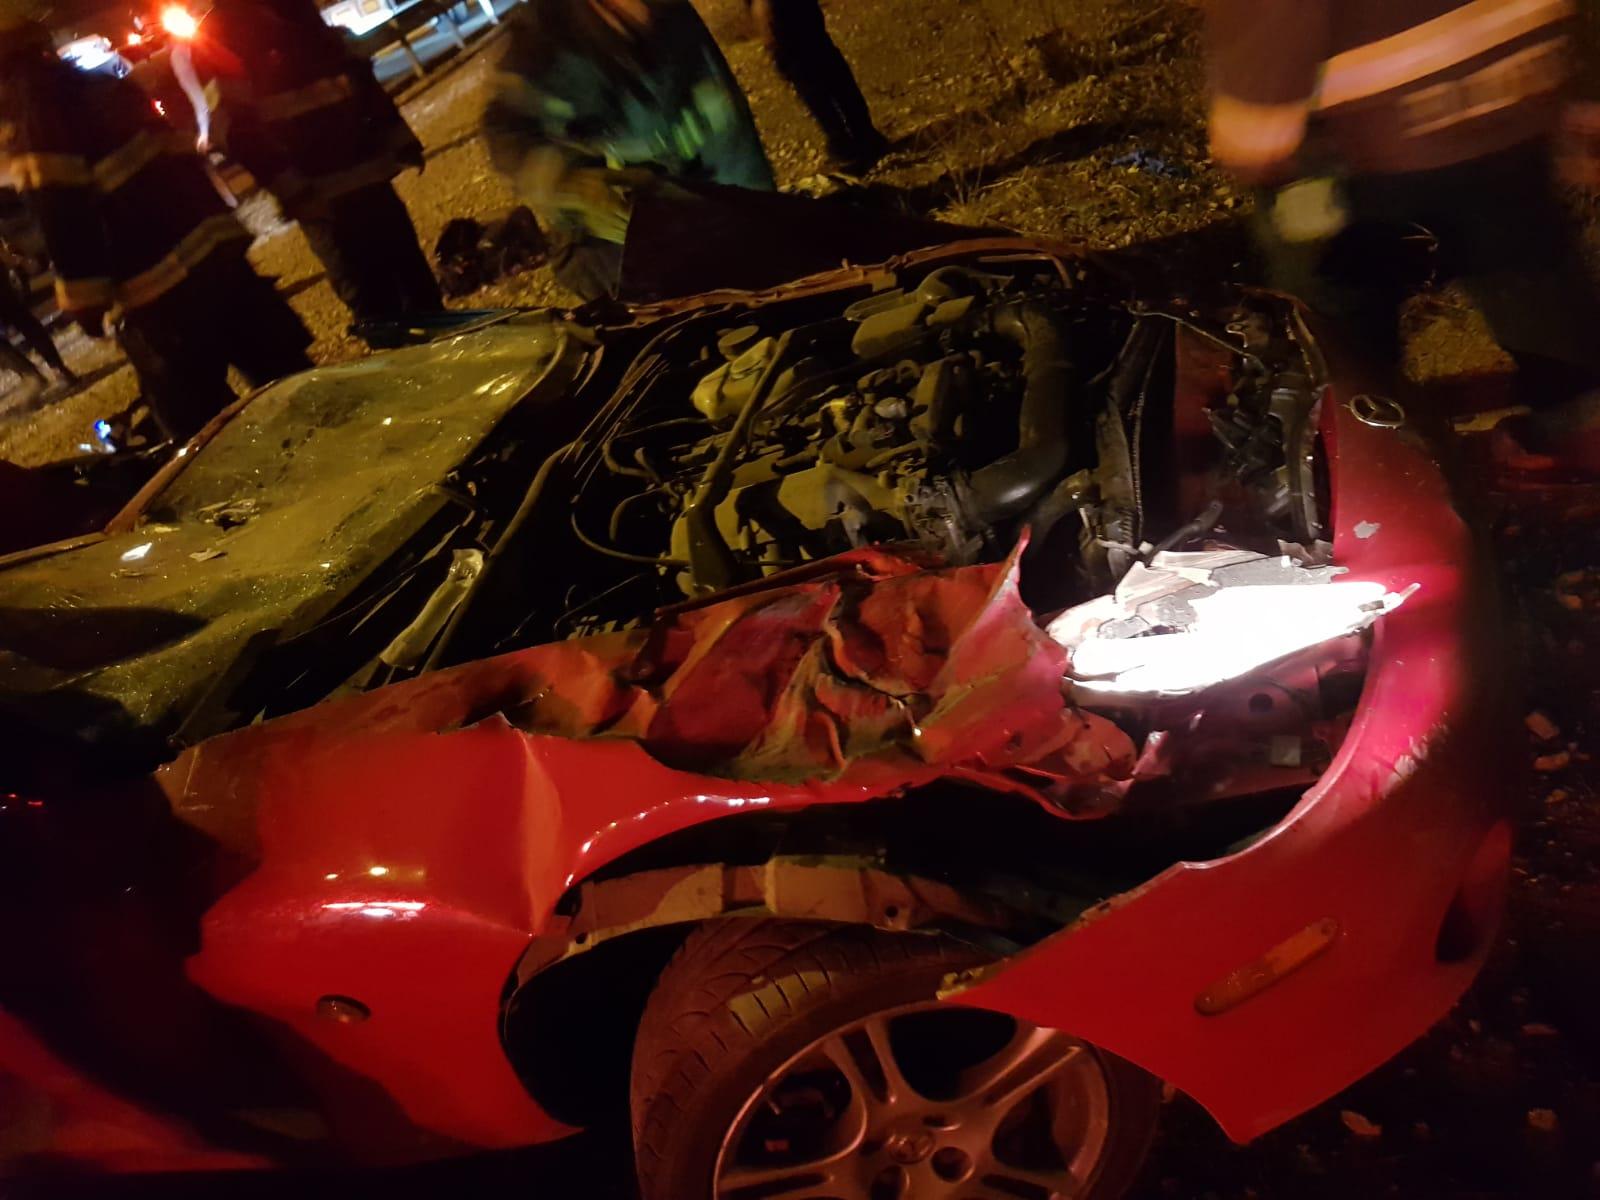 Photo of תאונה קשה במחלף נתניה כביש 2. הנהג בן ה-30 נותר לכוד מעוצמת ההתנגשות, מצבו קשה